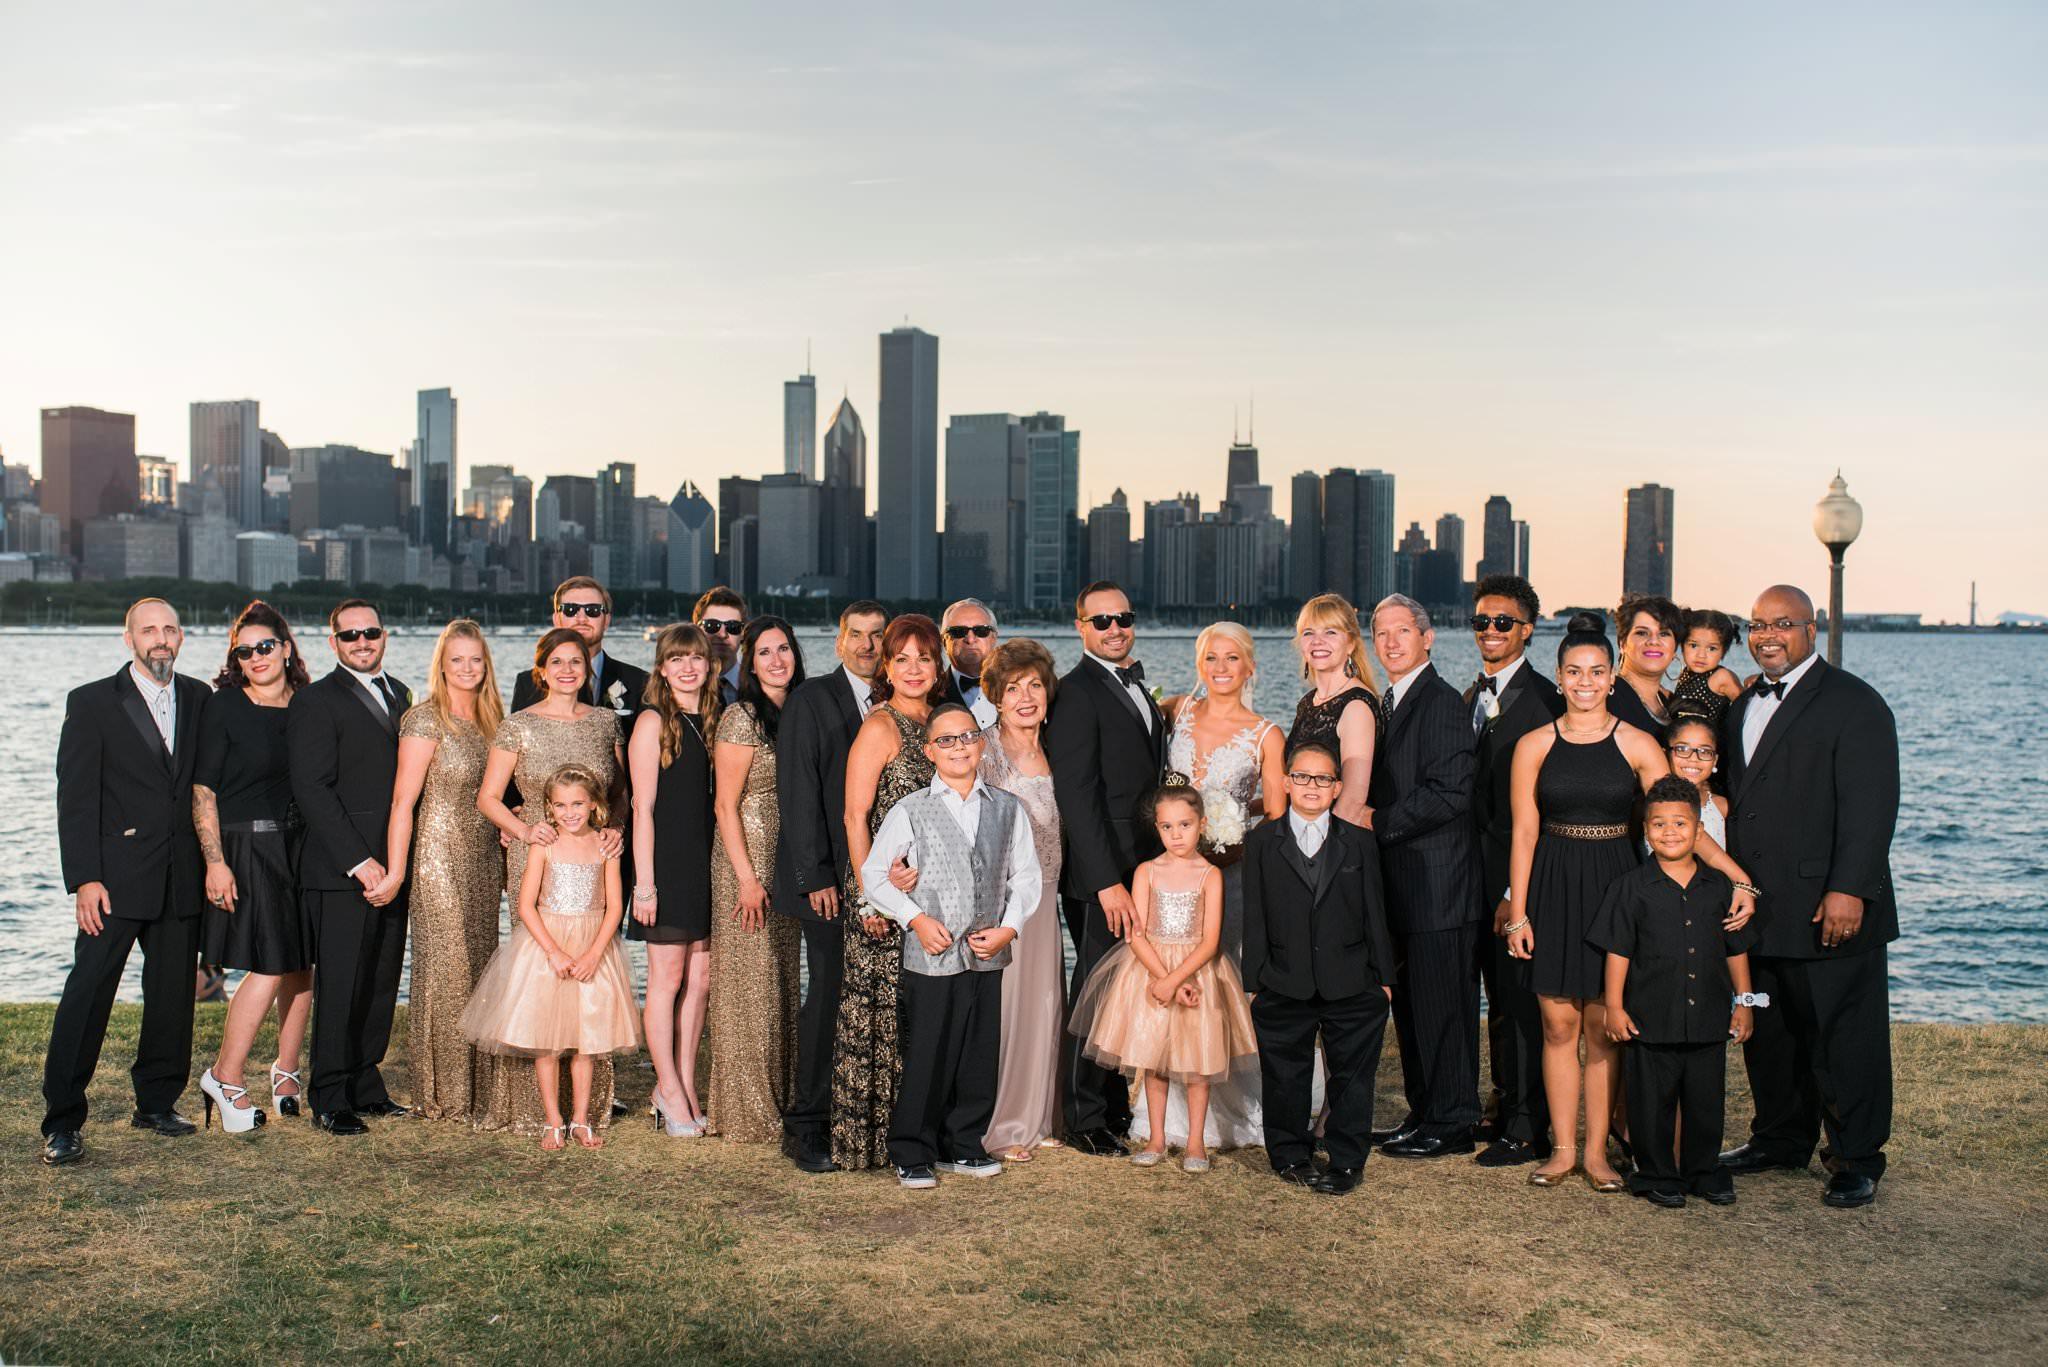 Adler-Planetarium-Chicago-Wedding-Photography-0072.JPG